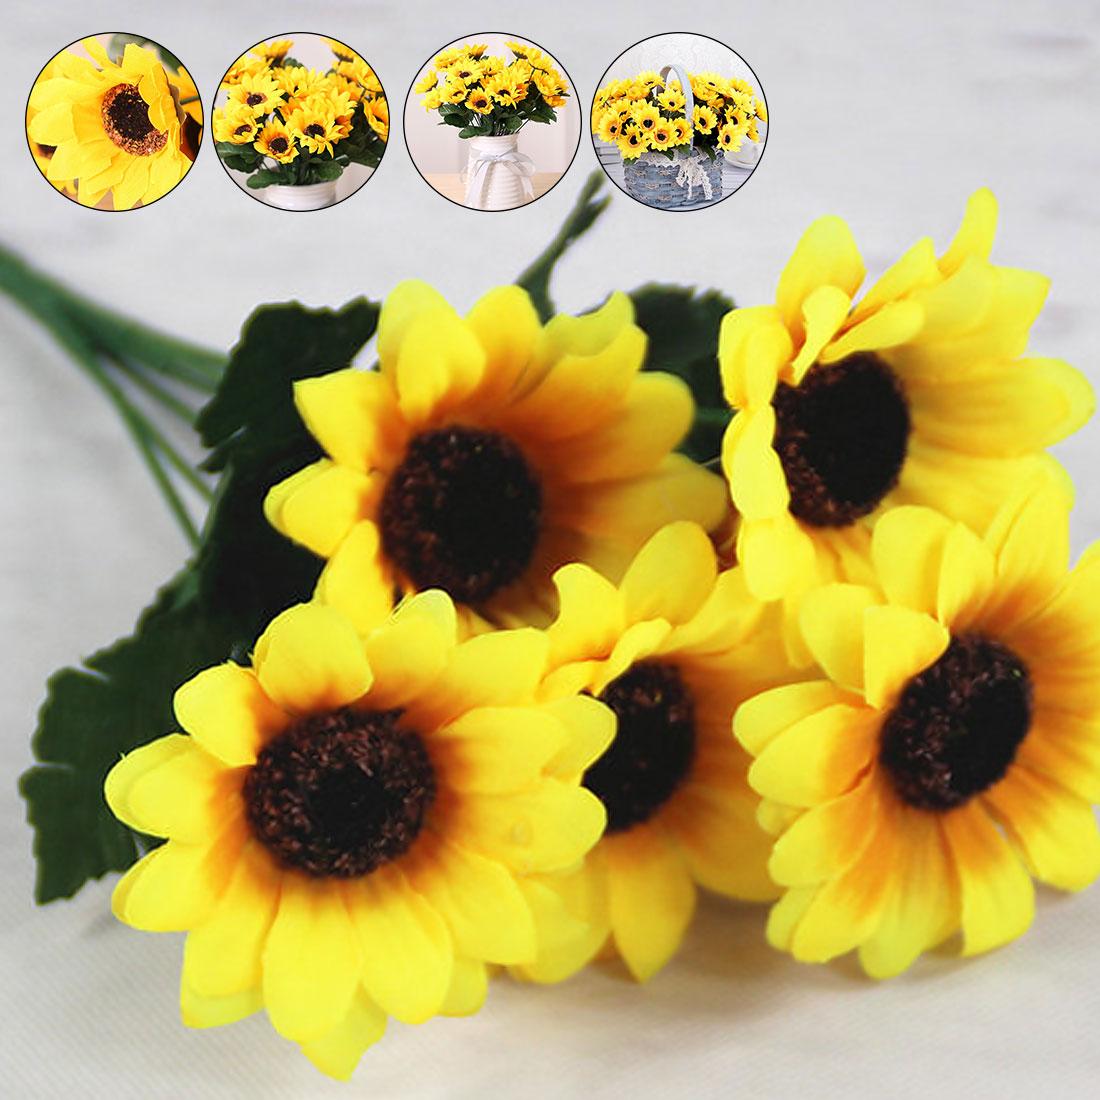 Best Offers For Silk Sunflower Wedding Flower Arrangements List And Get Free Shipping A936